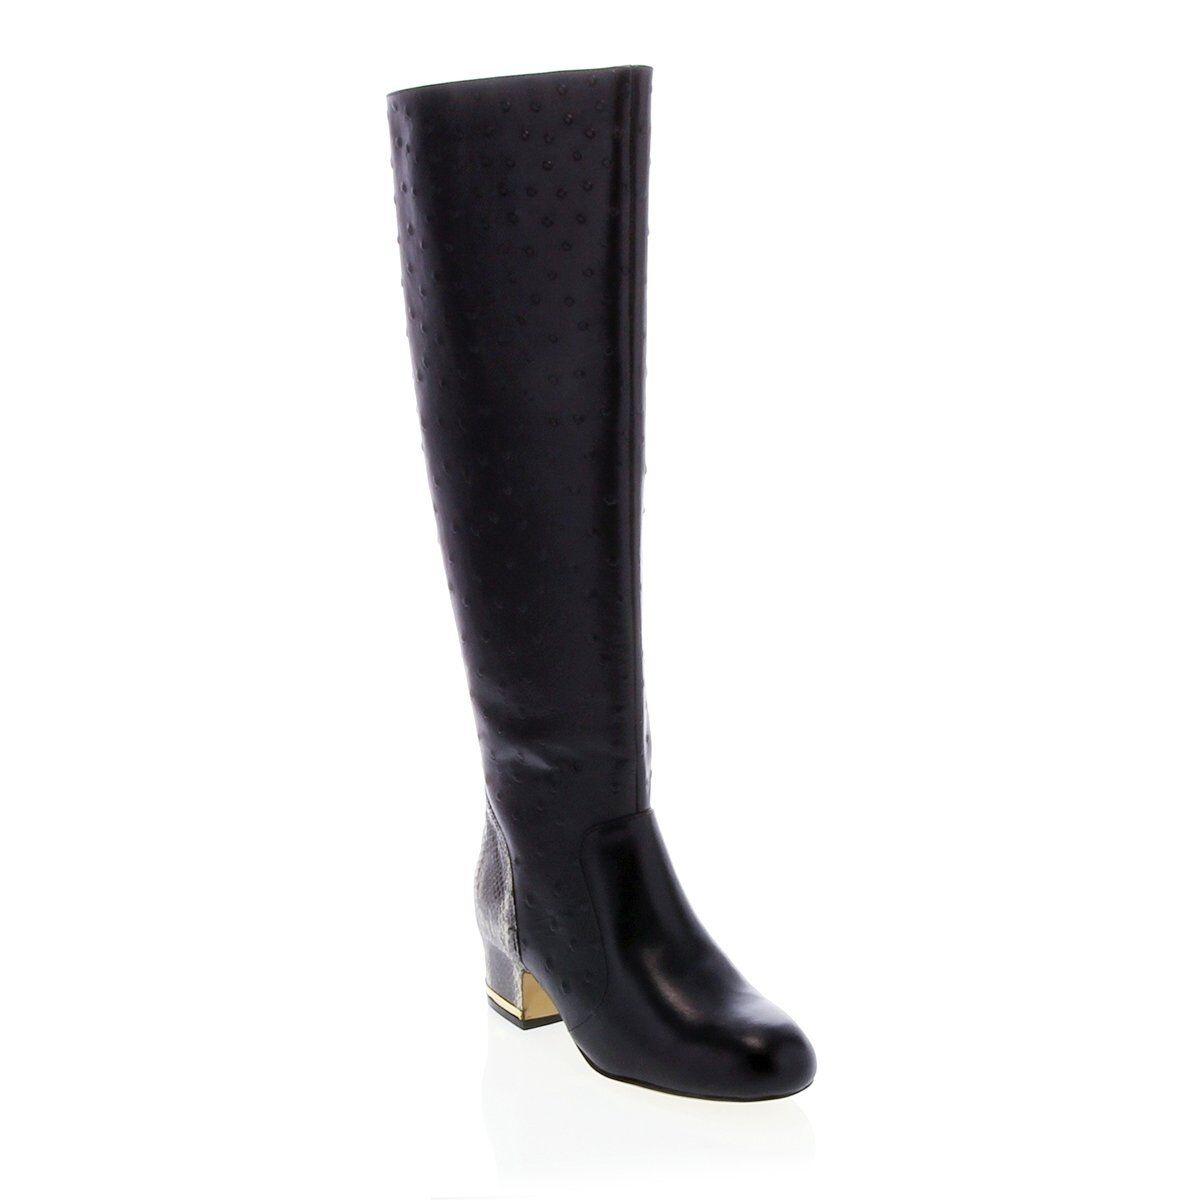 Deesigns Ostrich Embossed Leder Tall Boot 282232